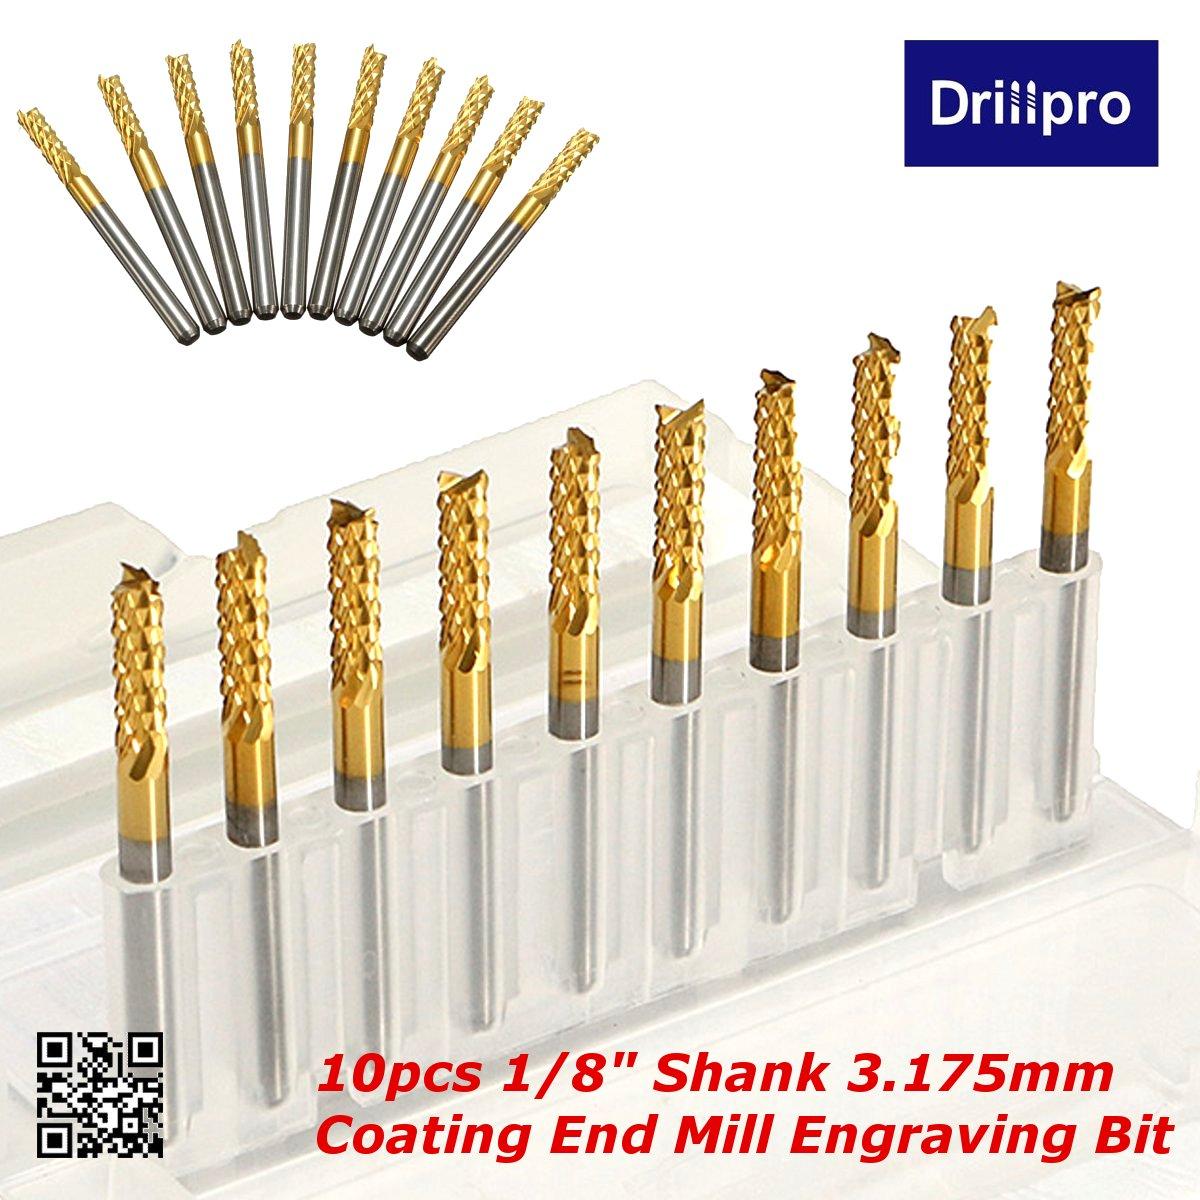 Drillpro DB-M1 10pcs 0.8-3mm Titanium Coated Engraving Milling Cutter Carbide Bi